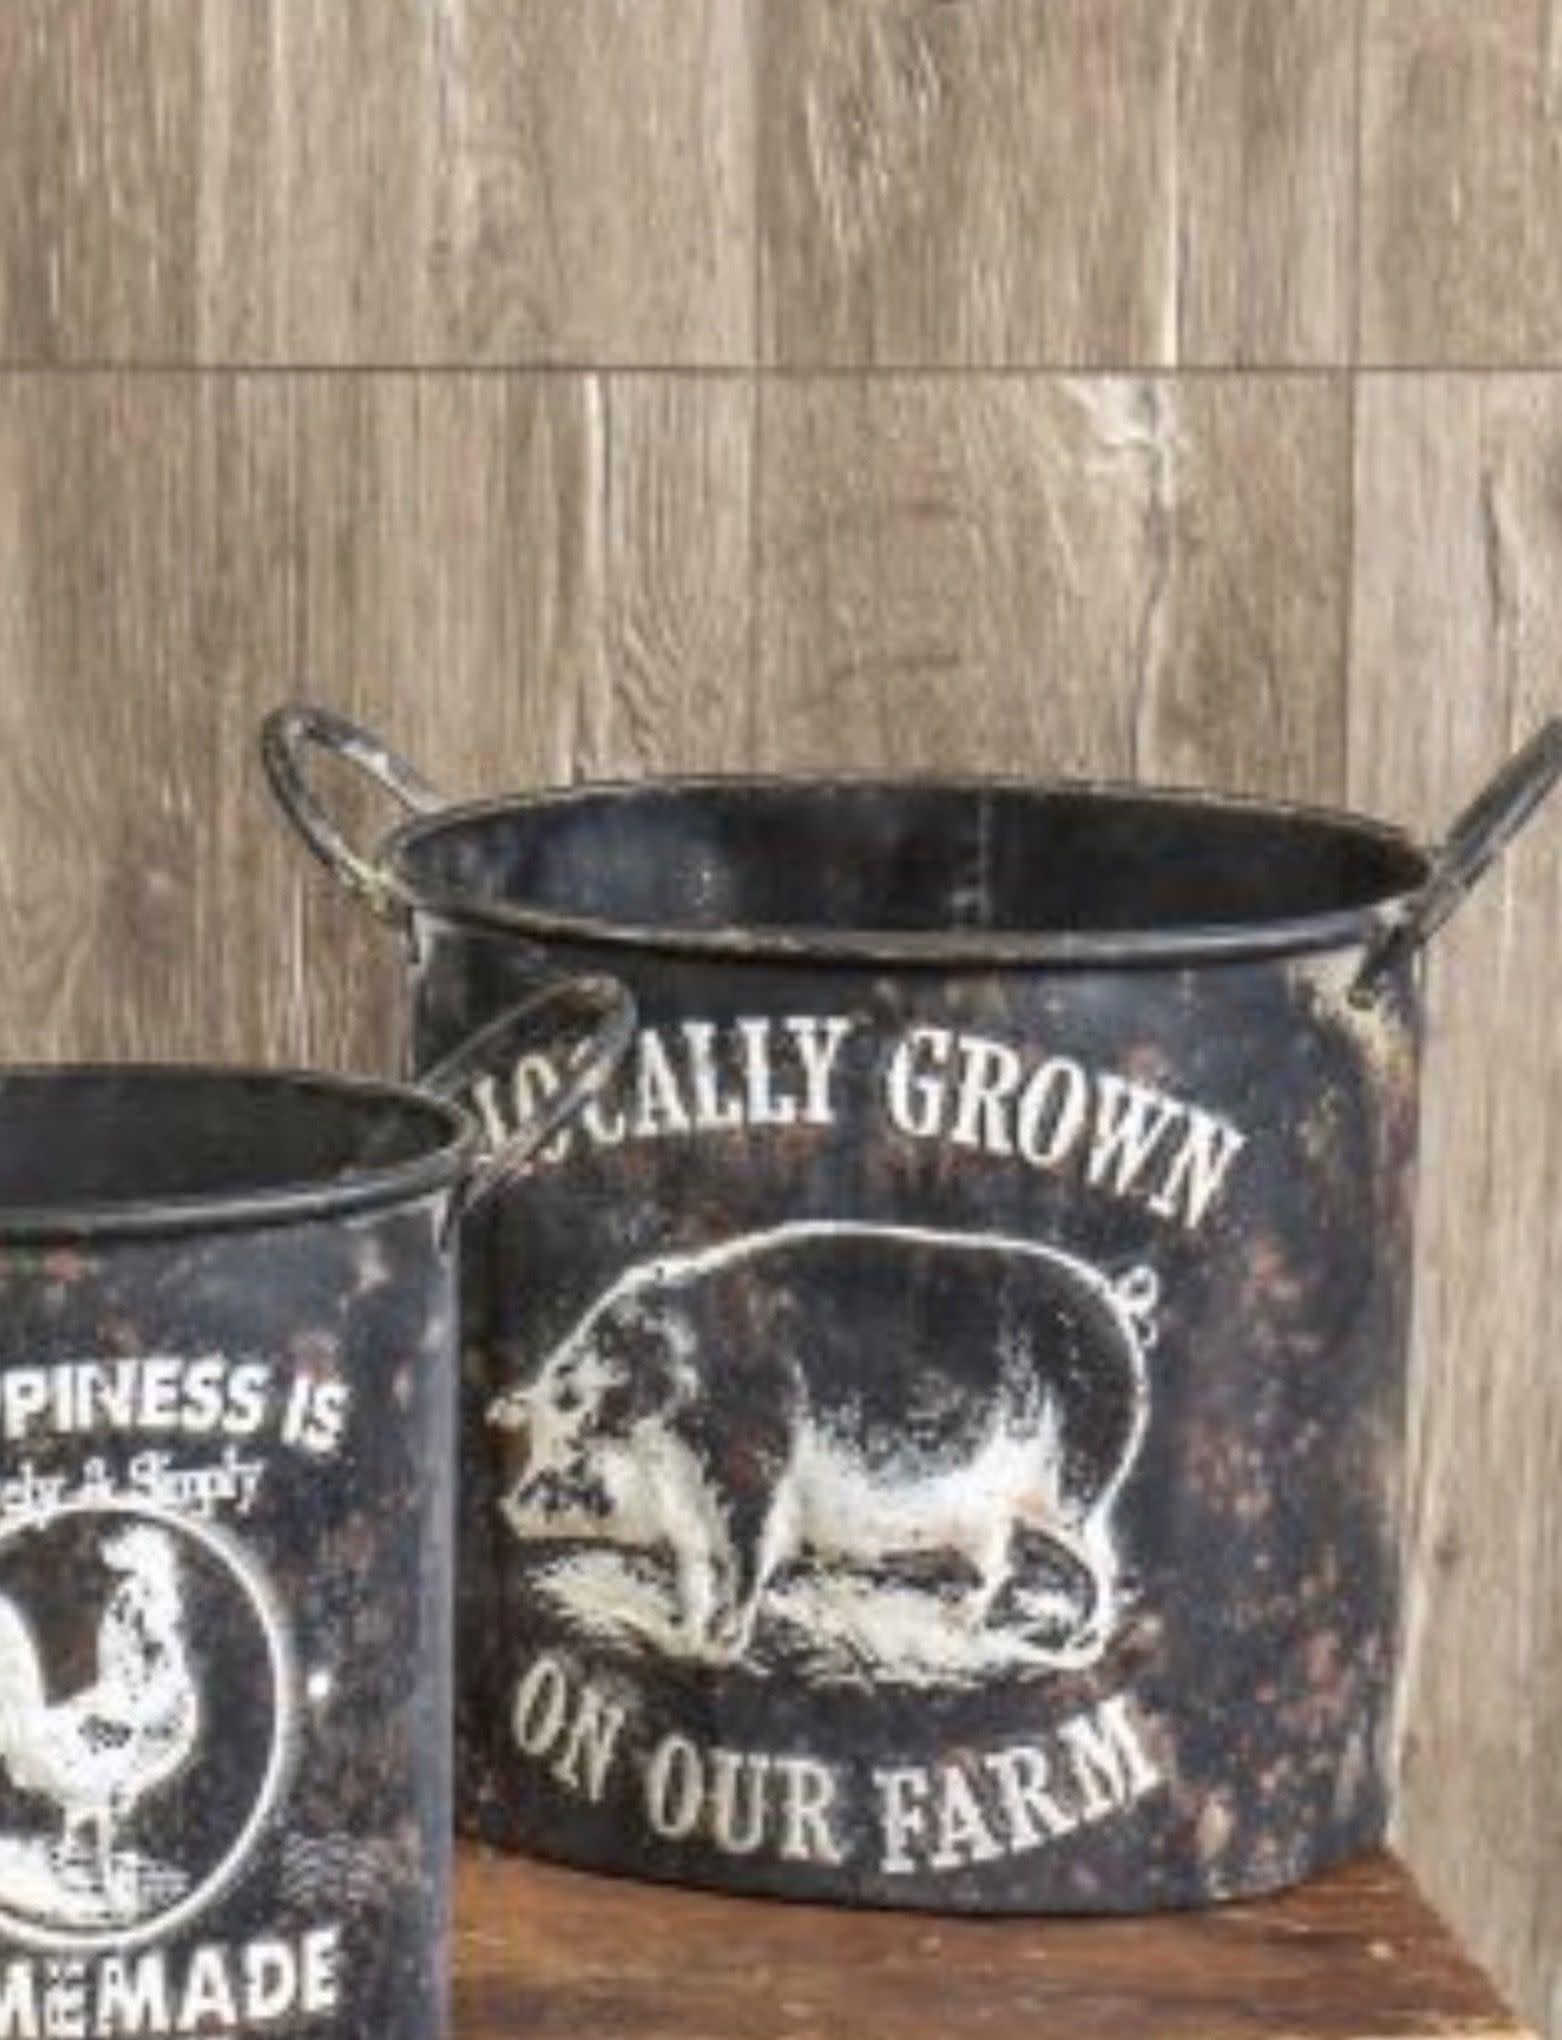 Ragon House Collection Locally Grown On Our Farm Pot - Medium